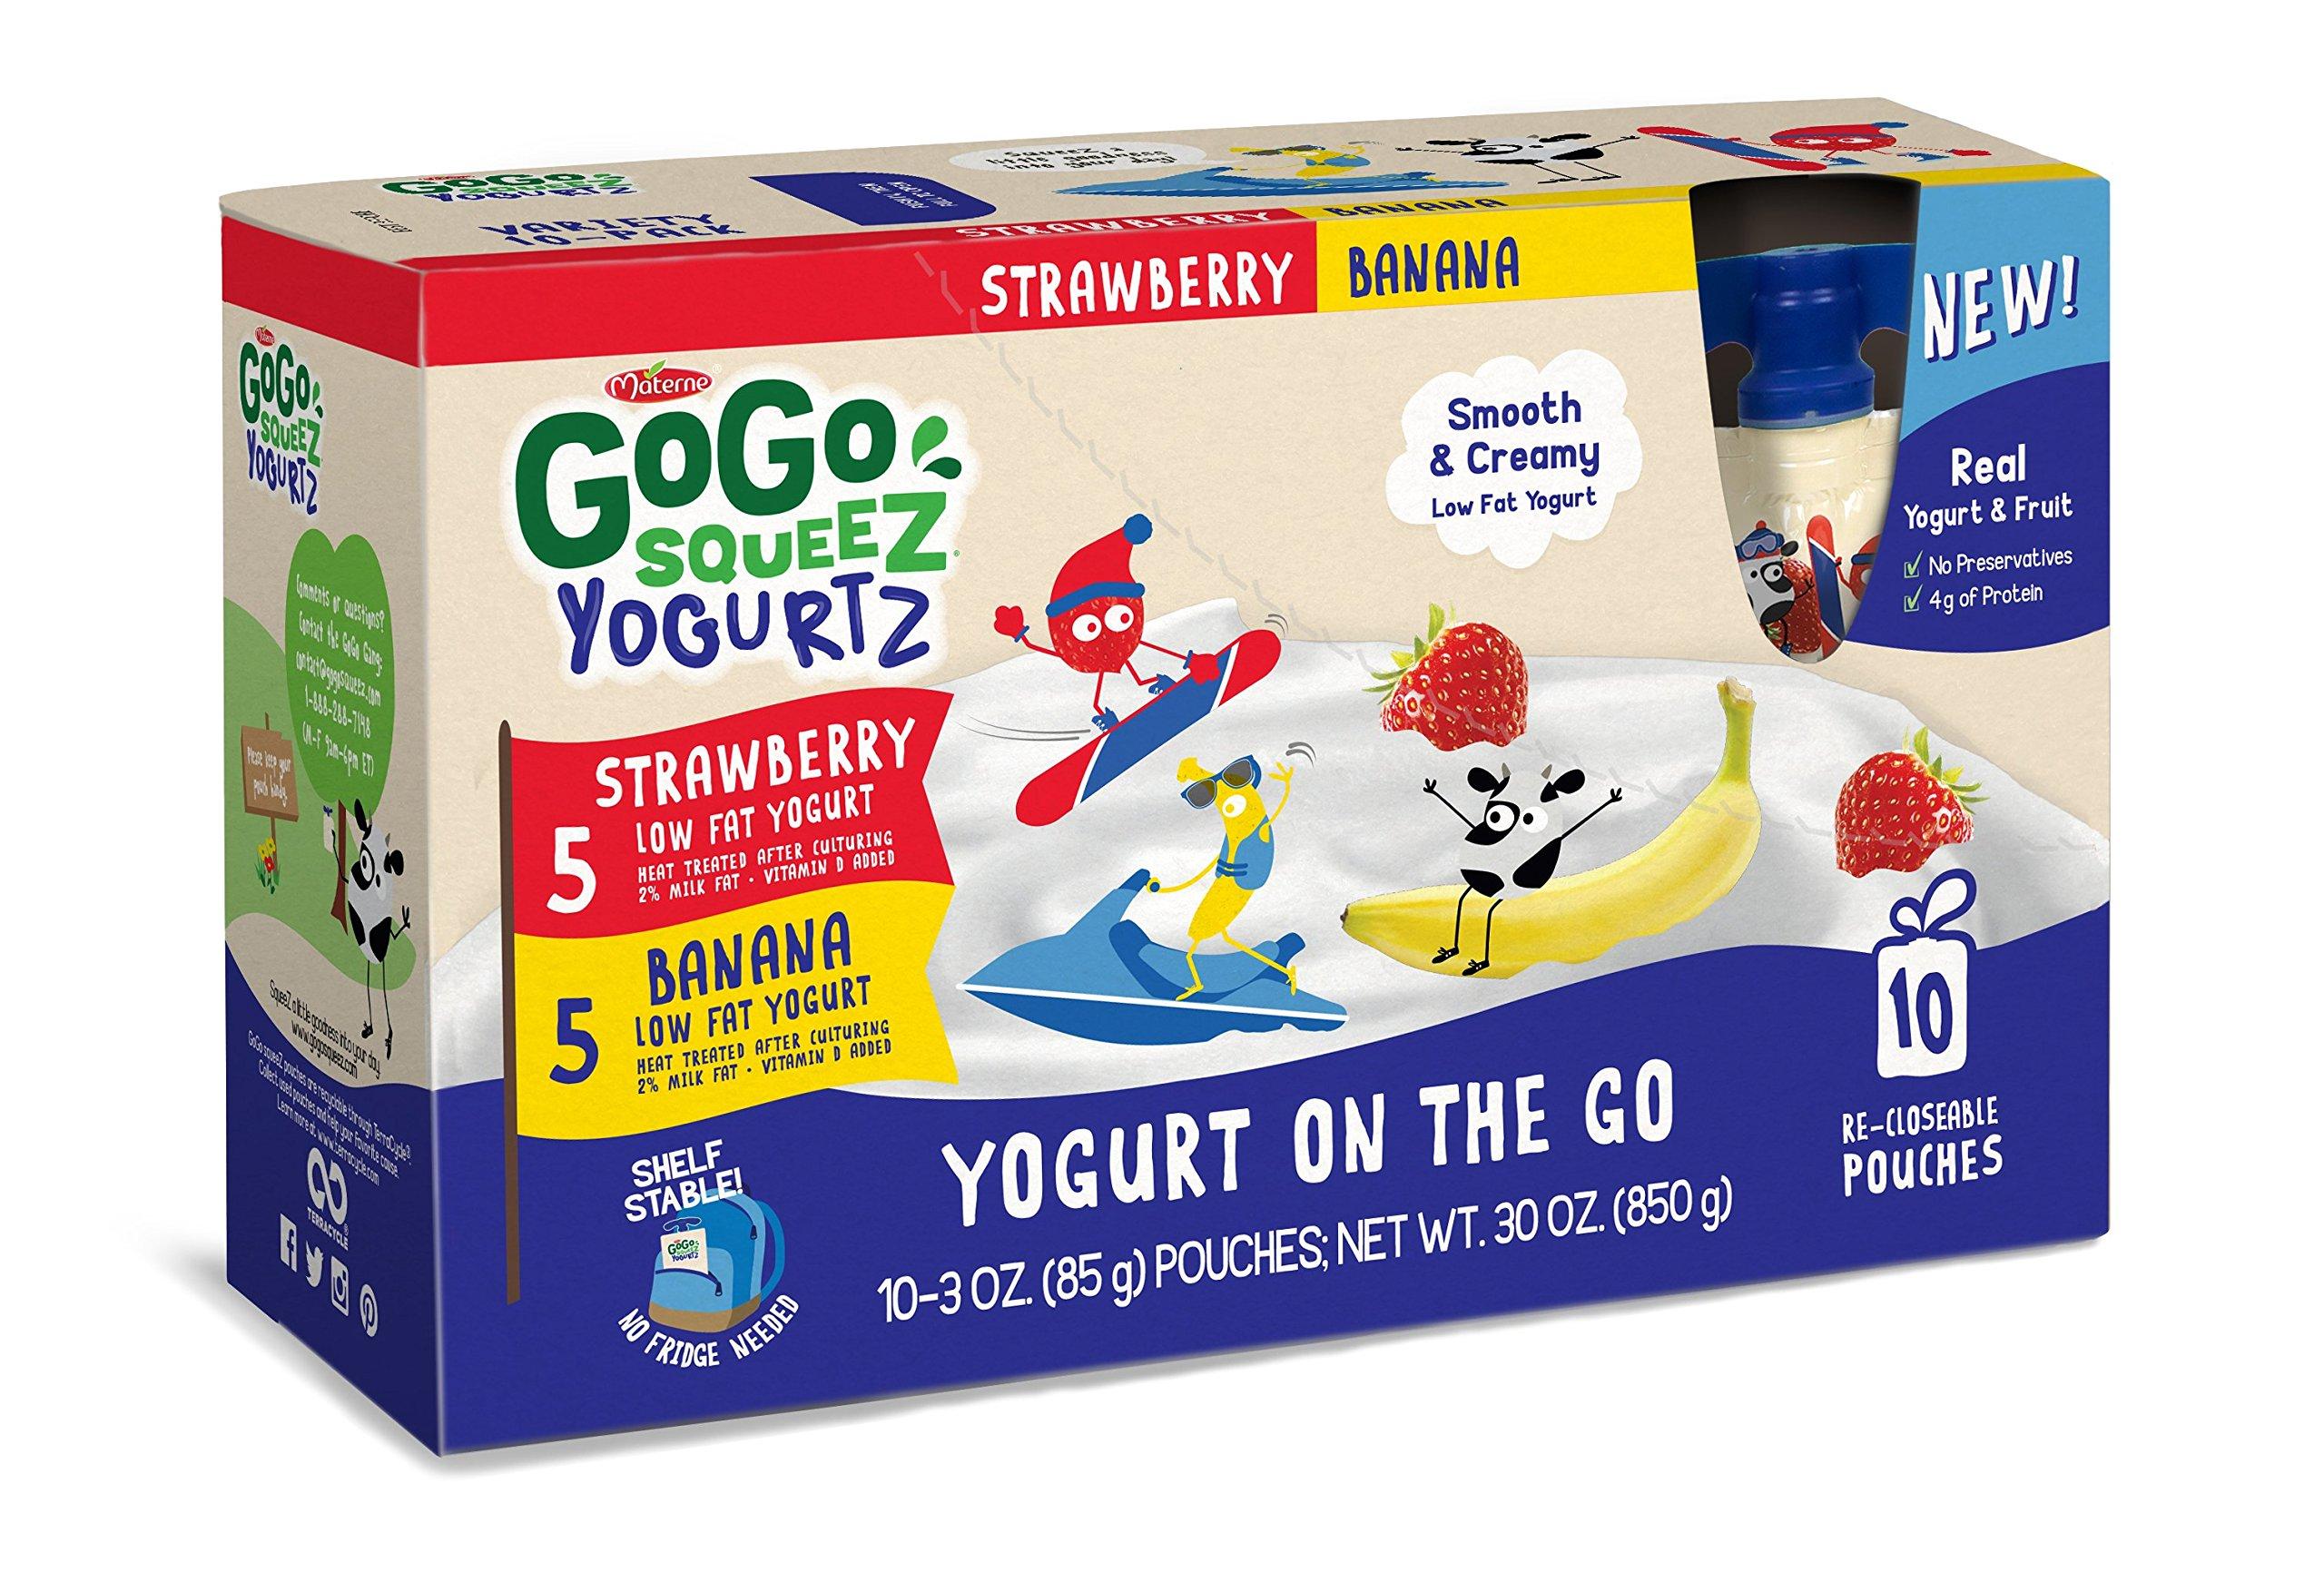 GoGo squeeZ YogurtZ, Variety Pack (Strawberry/Banana), 3-Ounce Portable BPA-Free Pouches, 10 Pouches